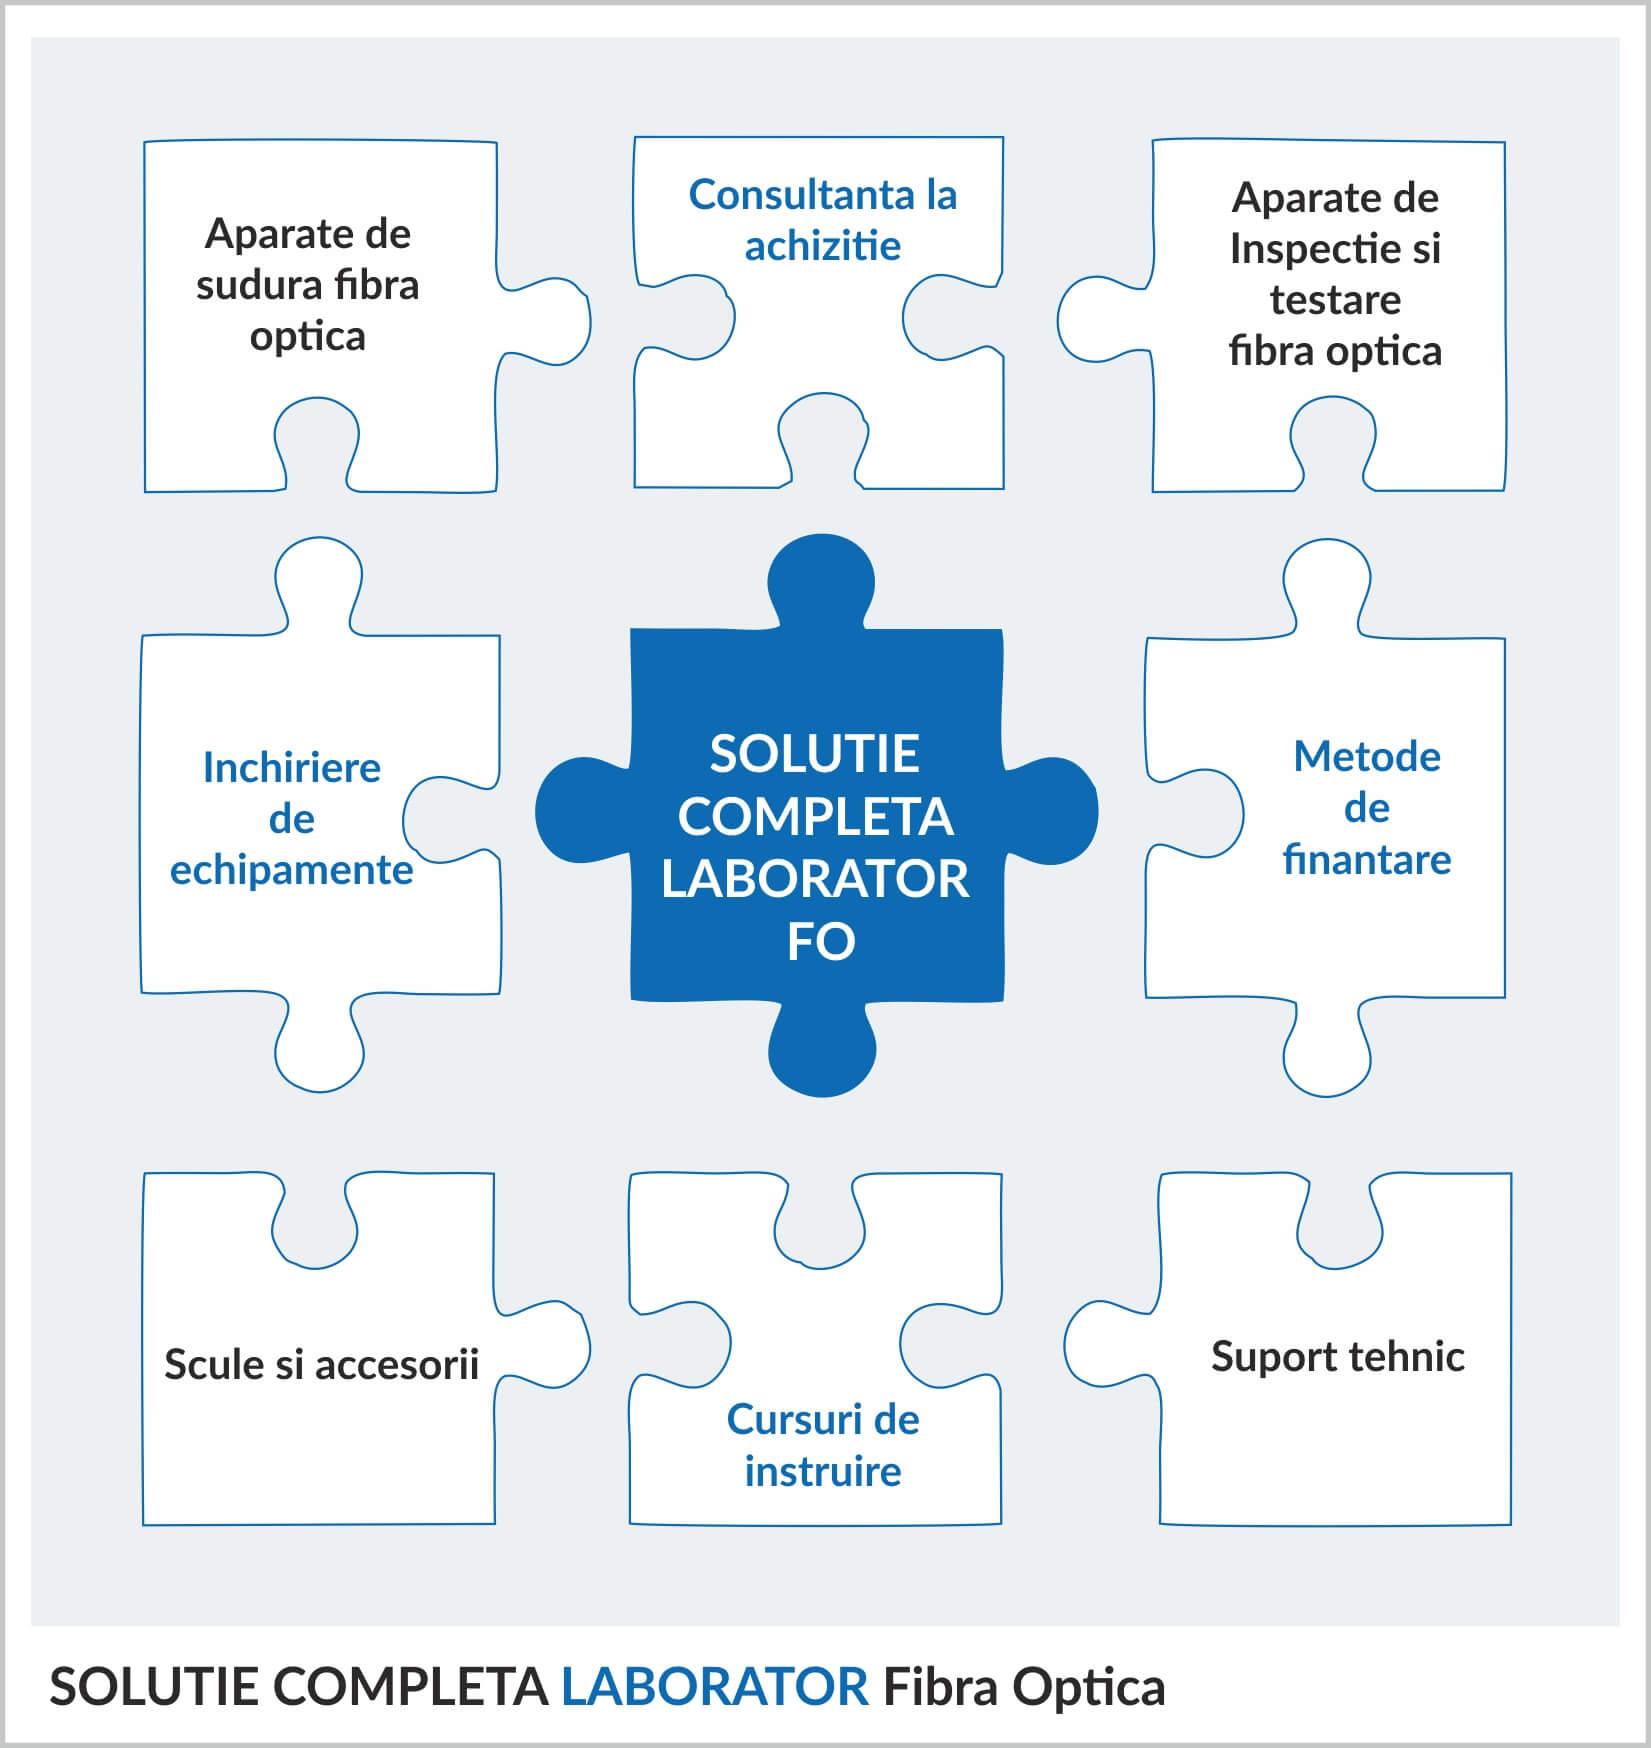 solutii-complete-laborator